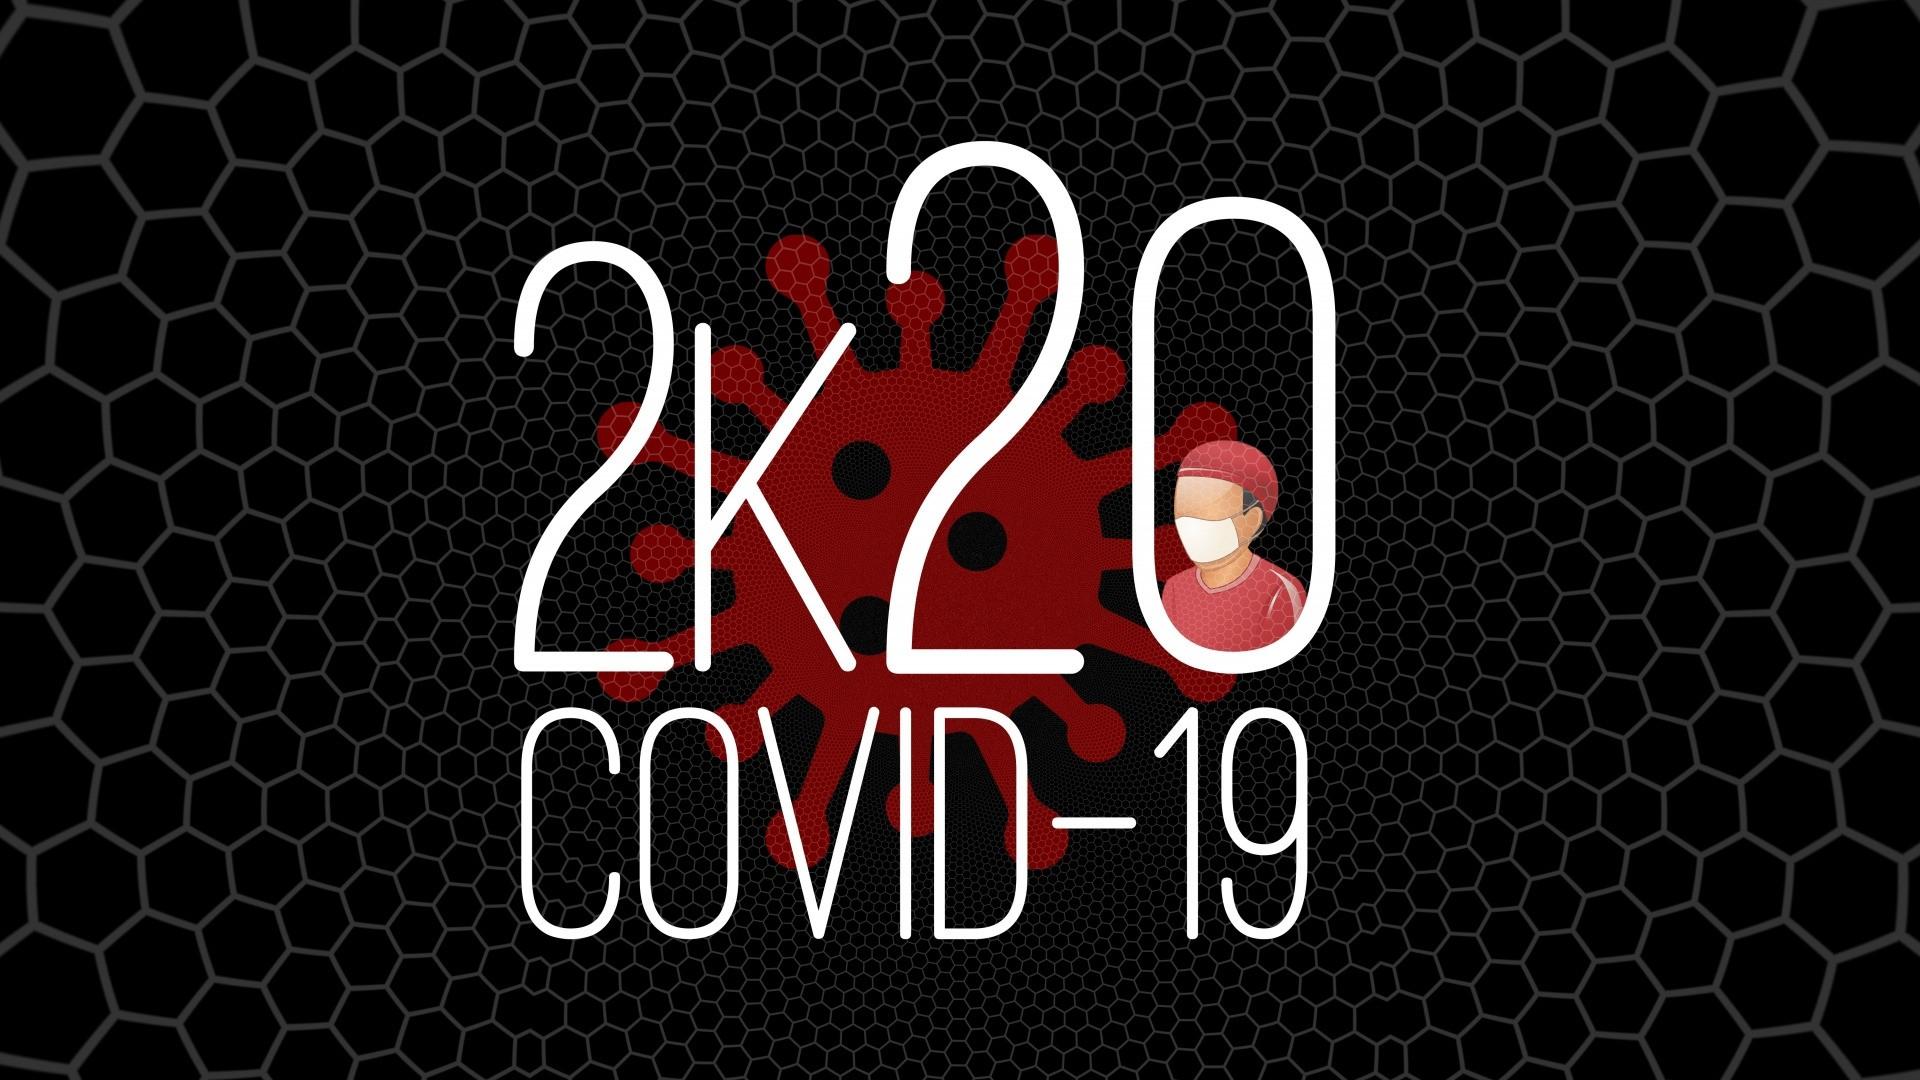 Covid 19 Background